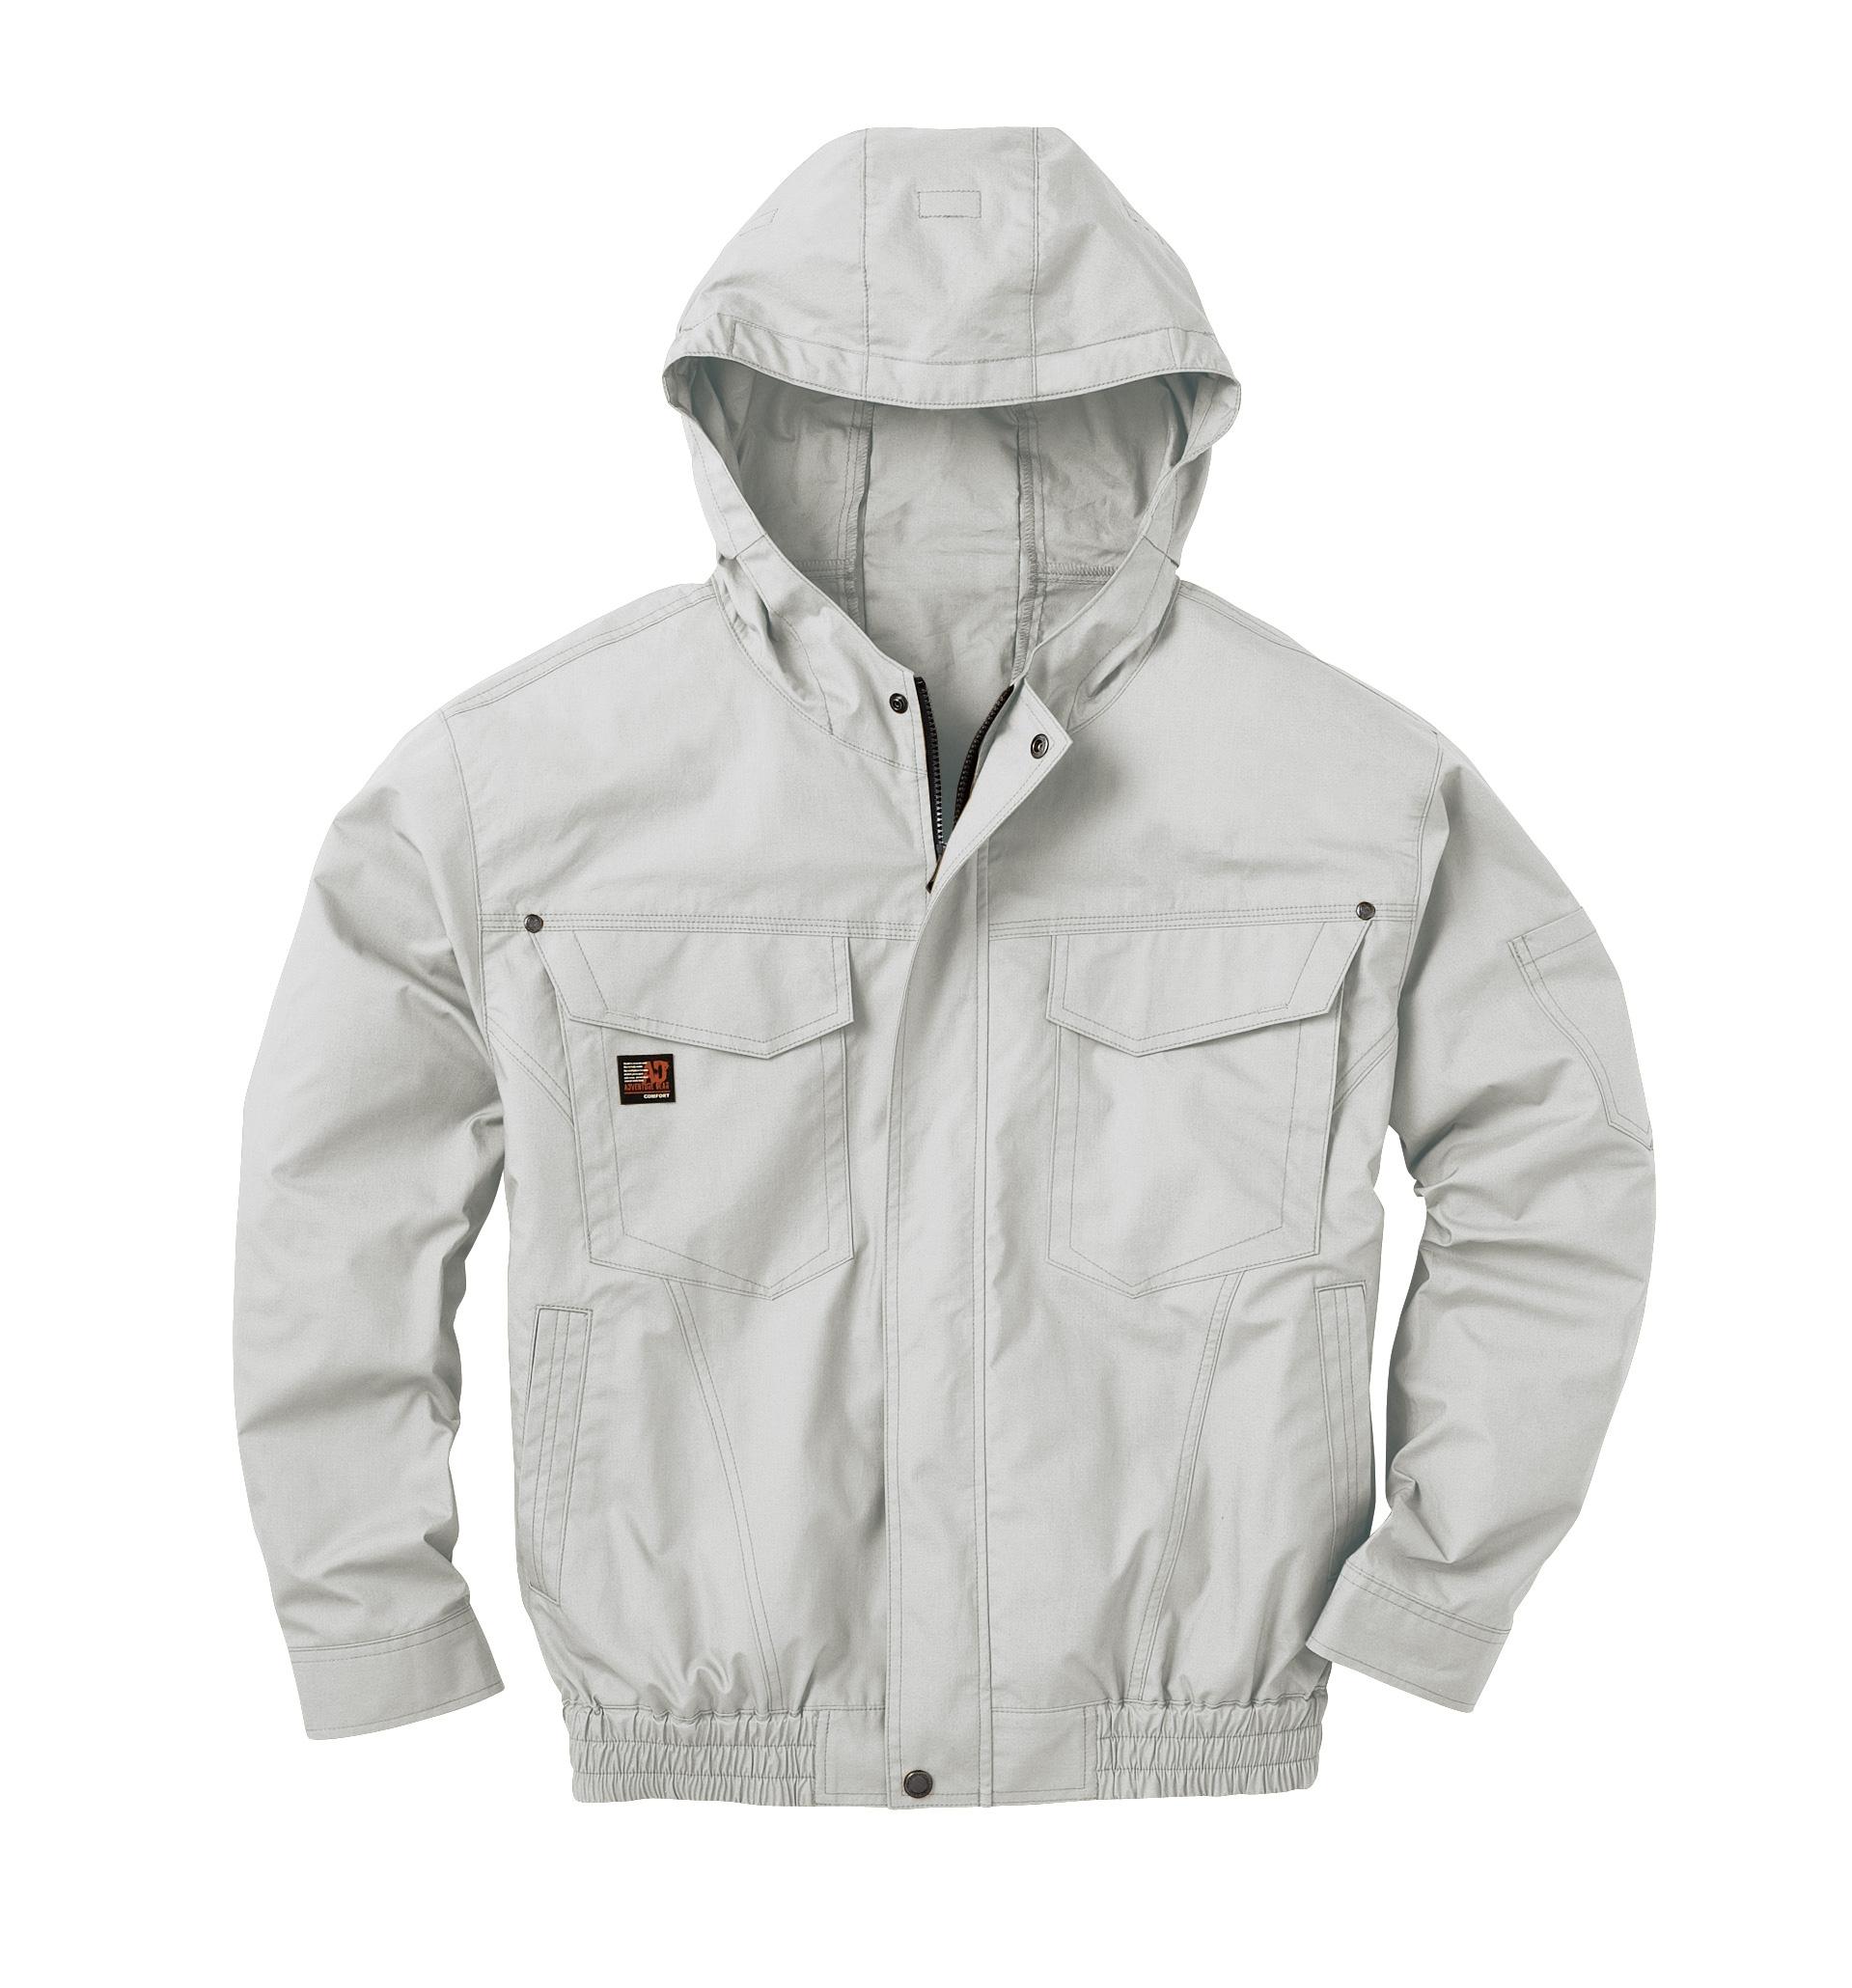 KU91410 綿100%のフード付き空調服 話題沸騰!猛暑・溶接作業対応ファン付き作業服 M-500F